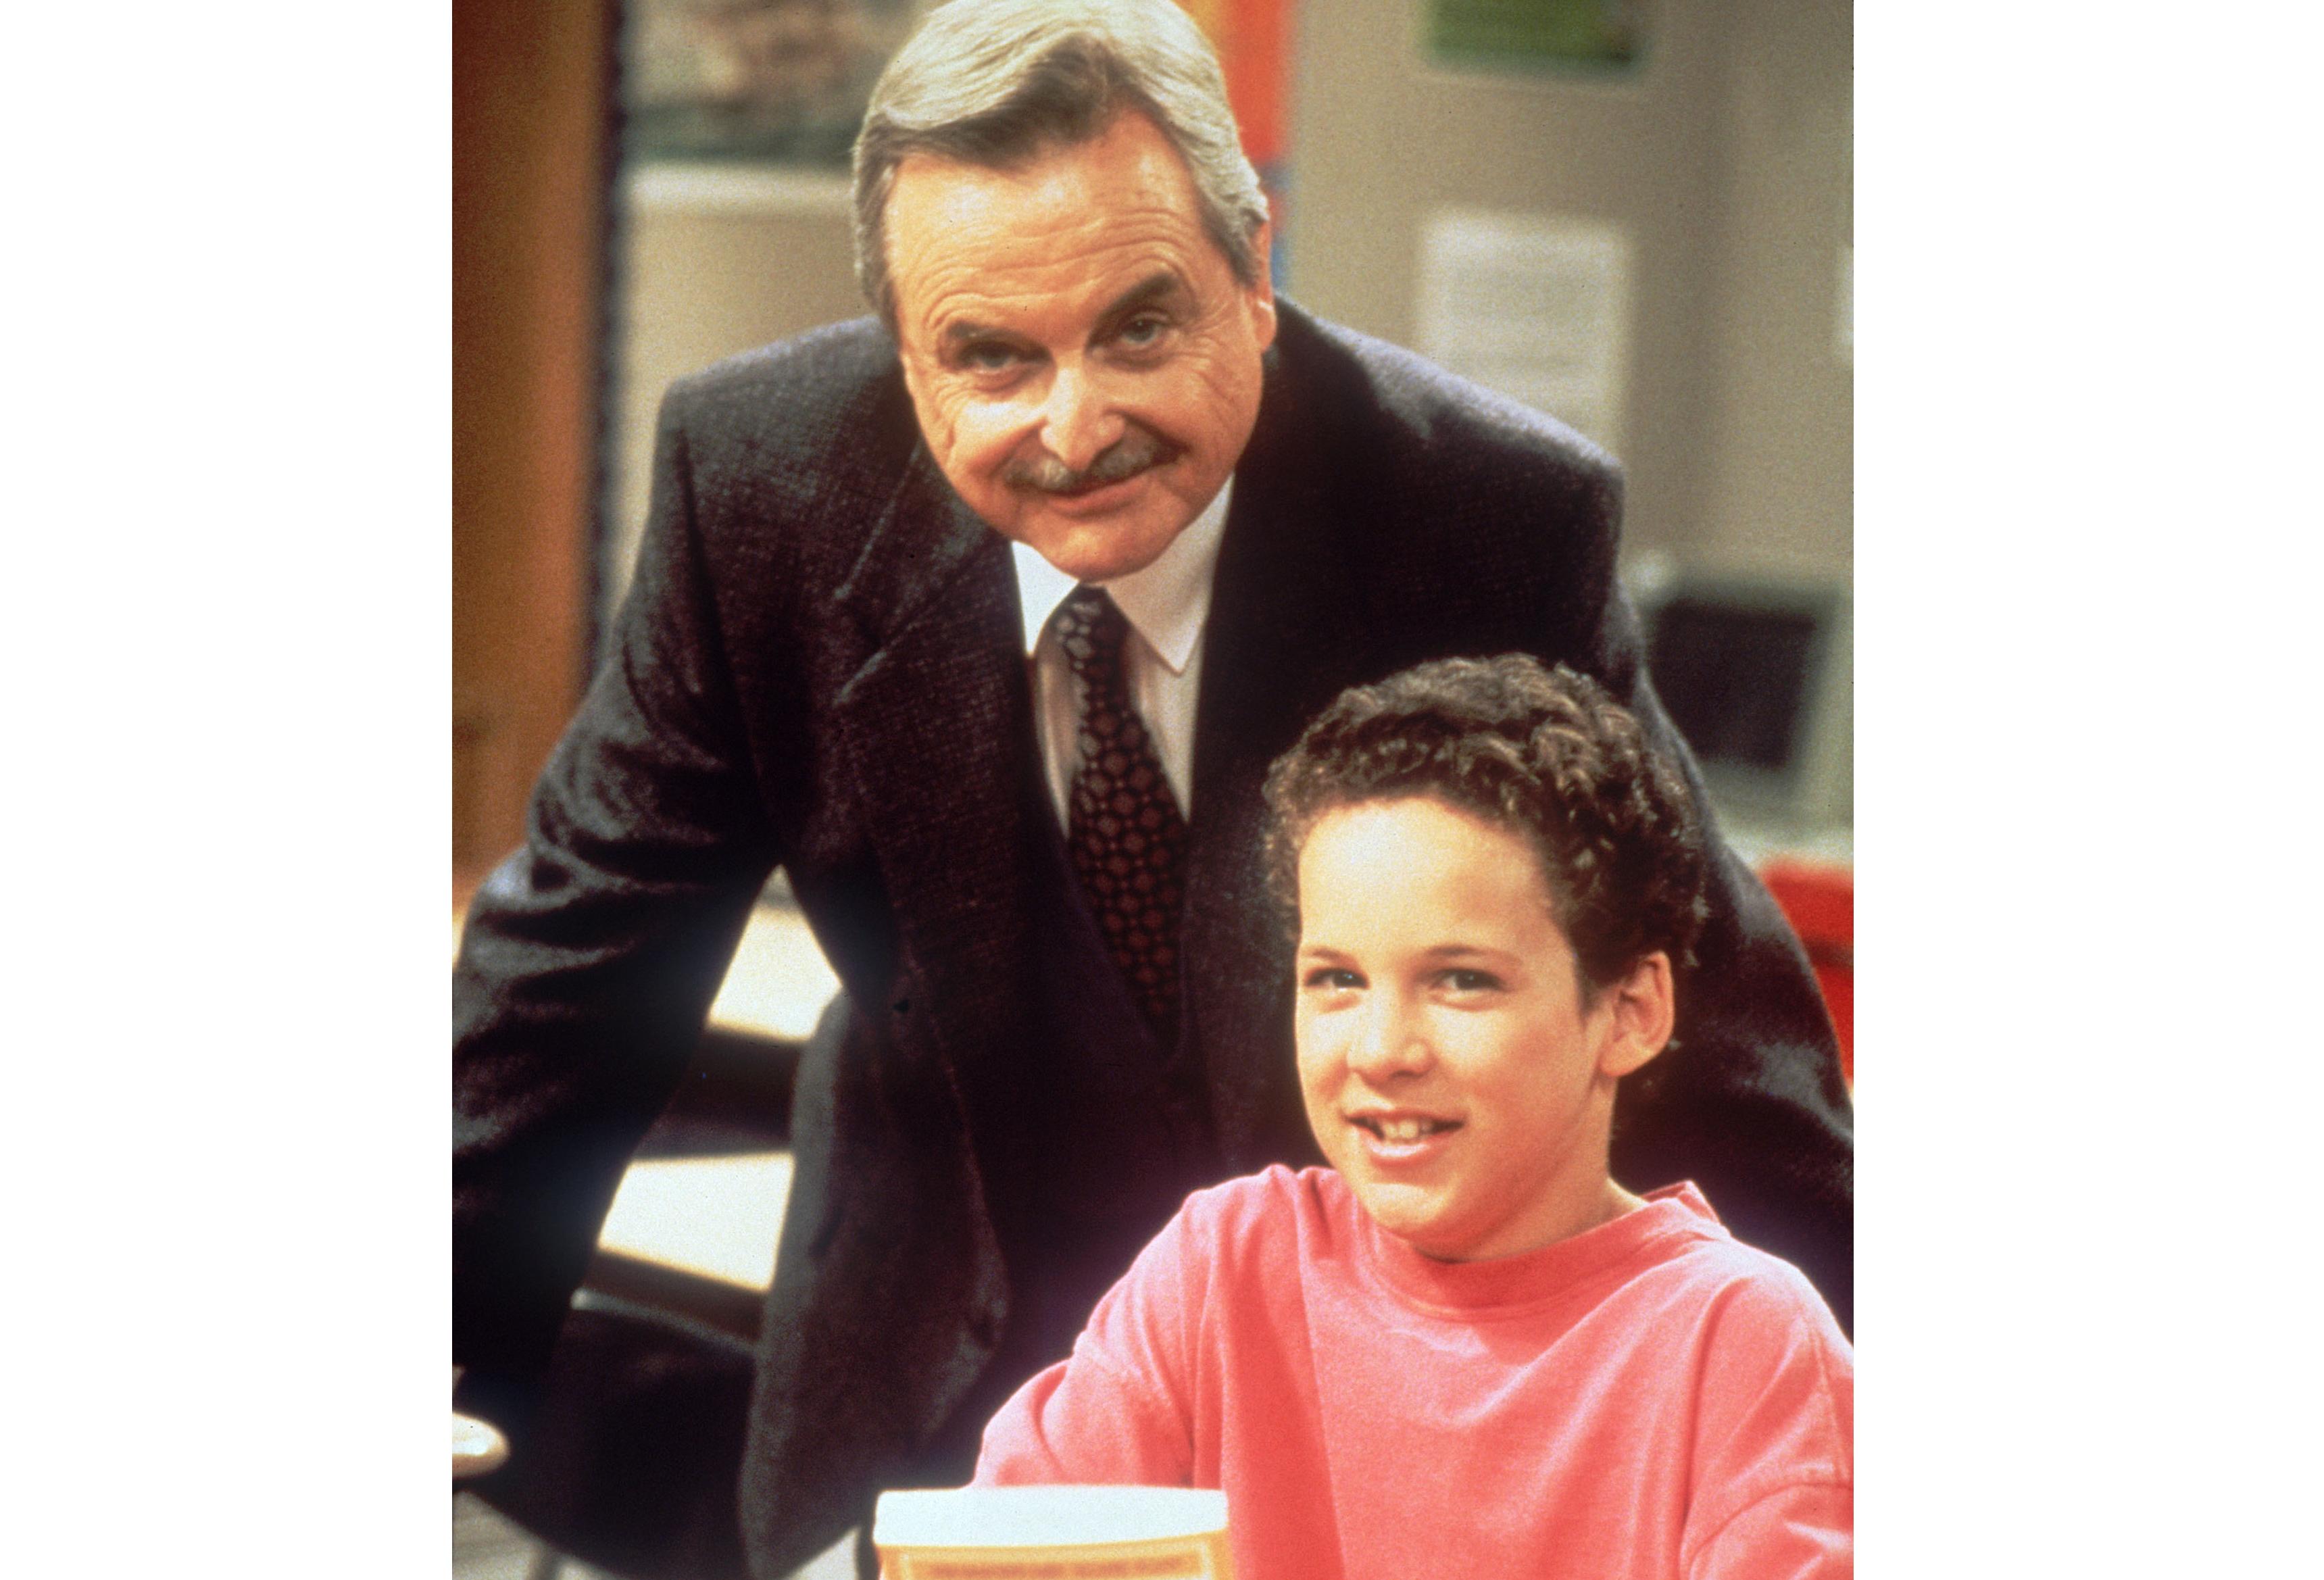 William Daniels and Ben Savage in 'Boy Meets World,' 1993.